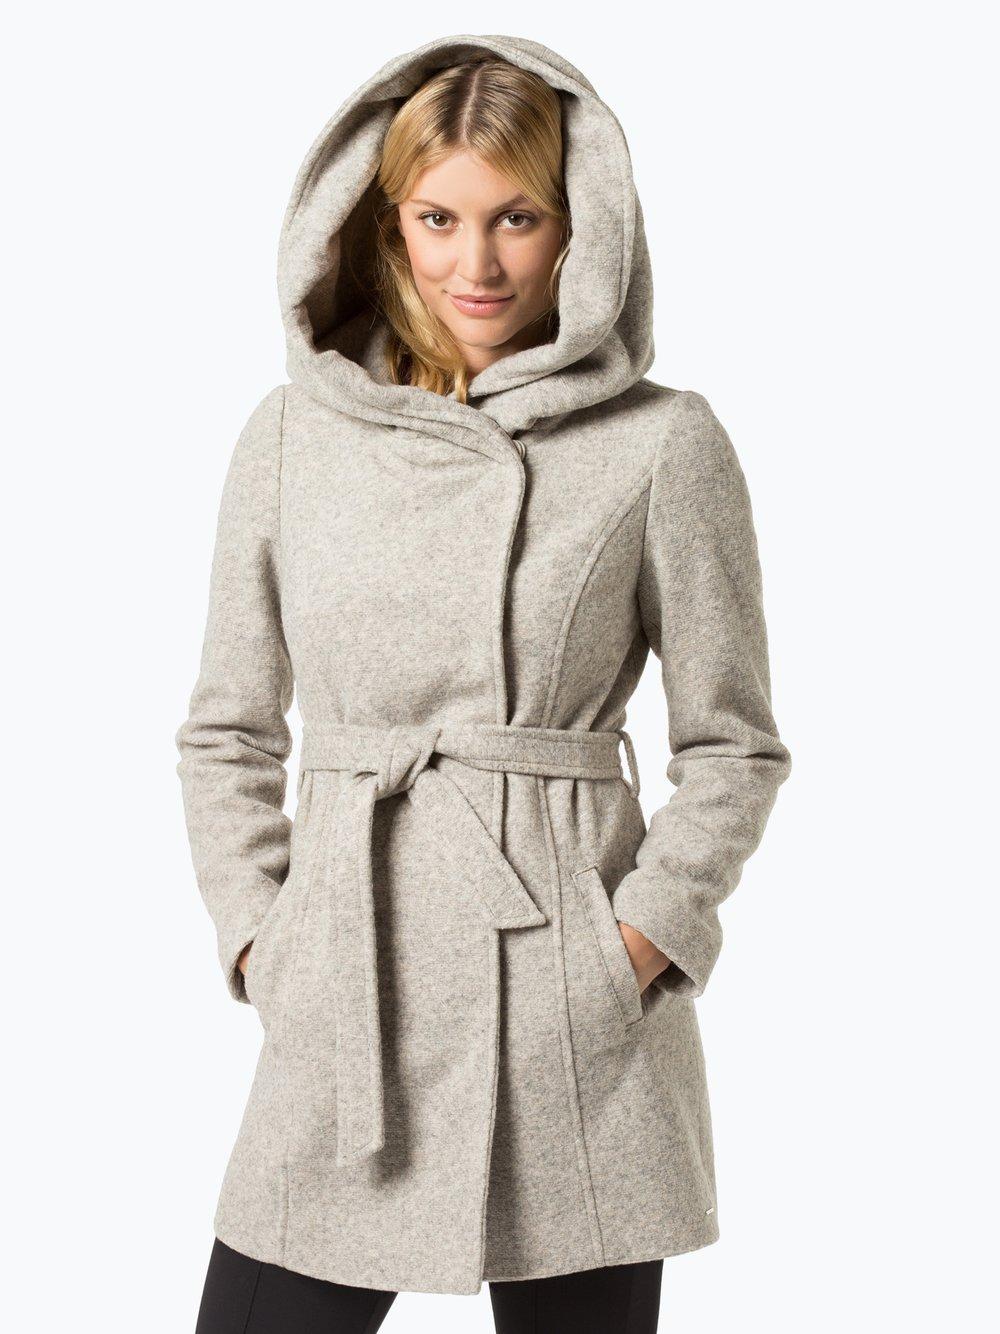 s.Oliver Damen Jacke online kaufen   VANGRAAF.COM